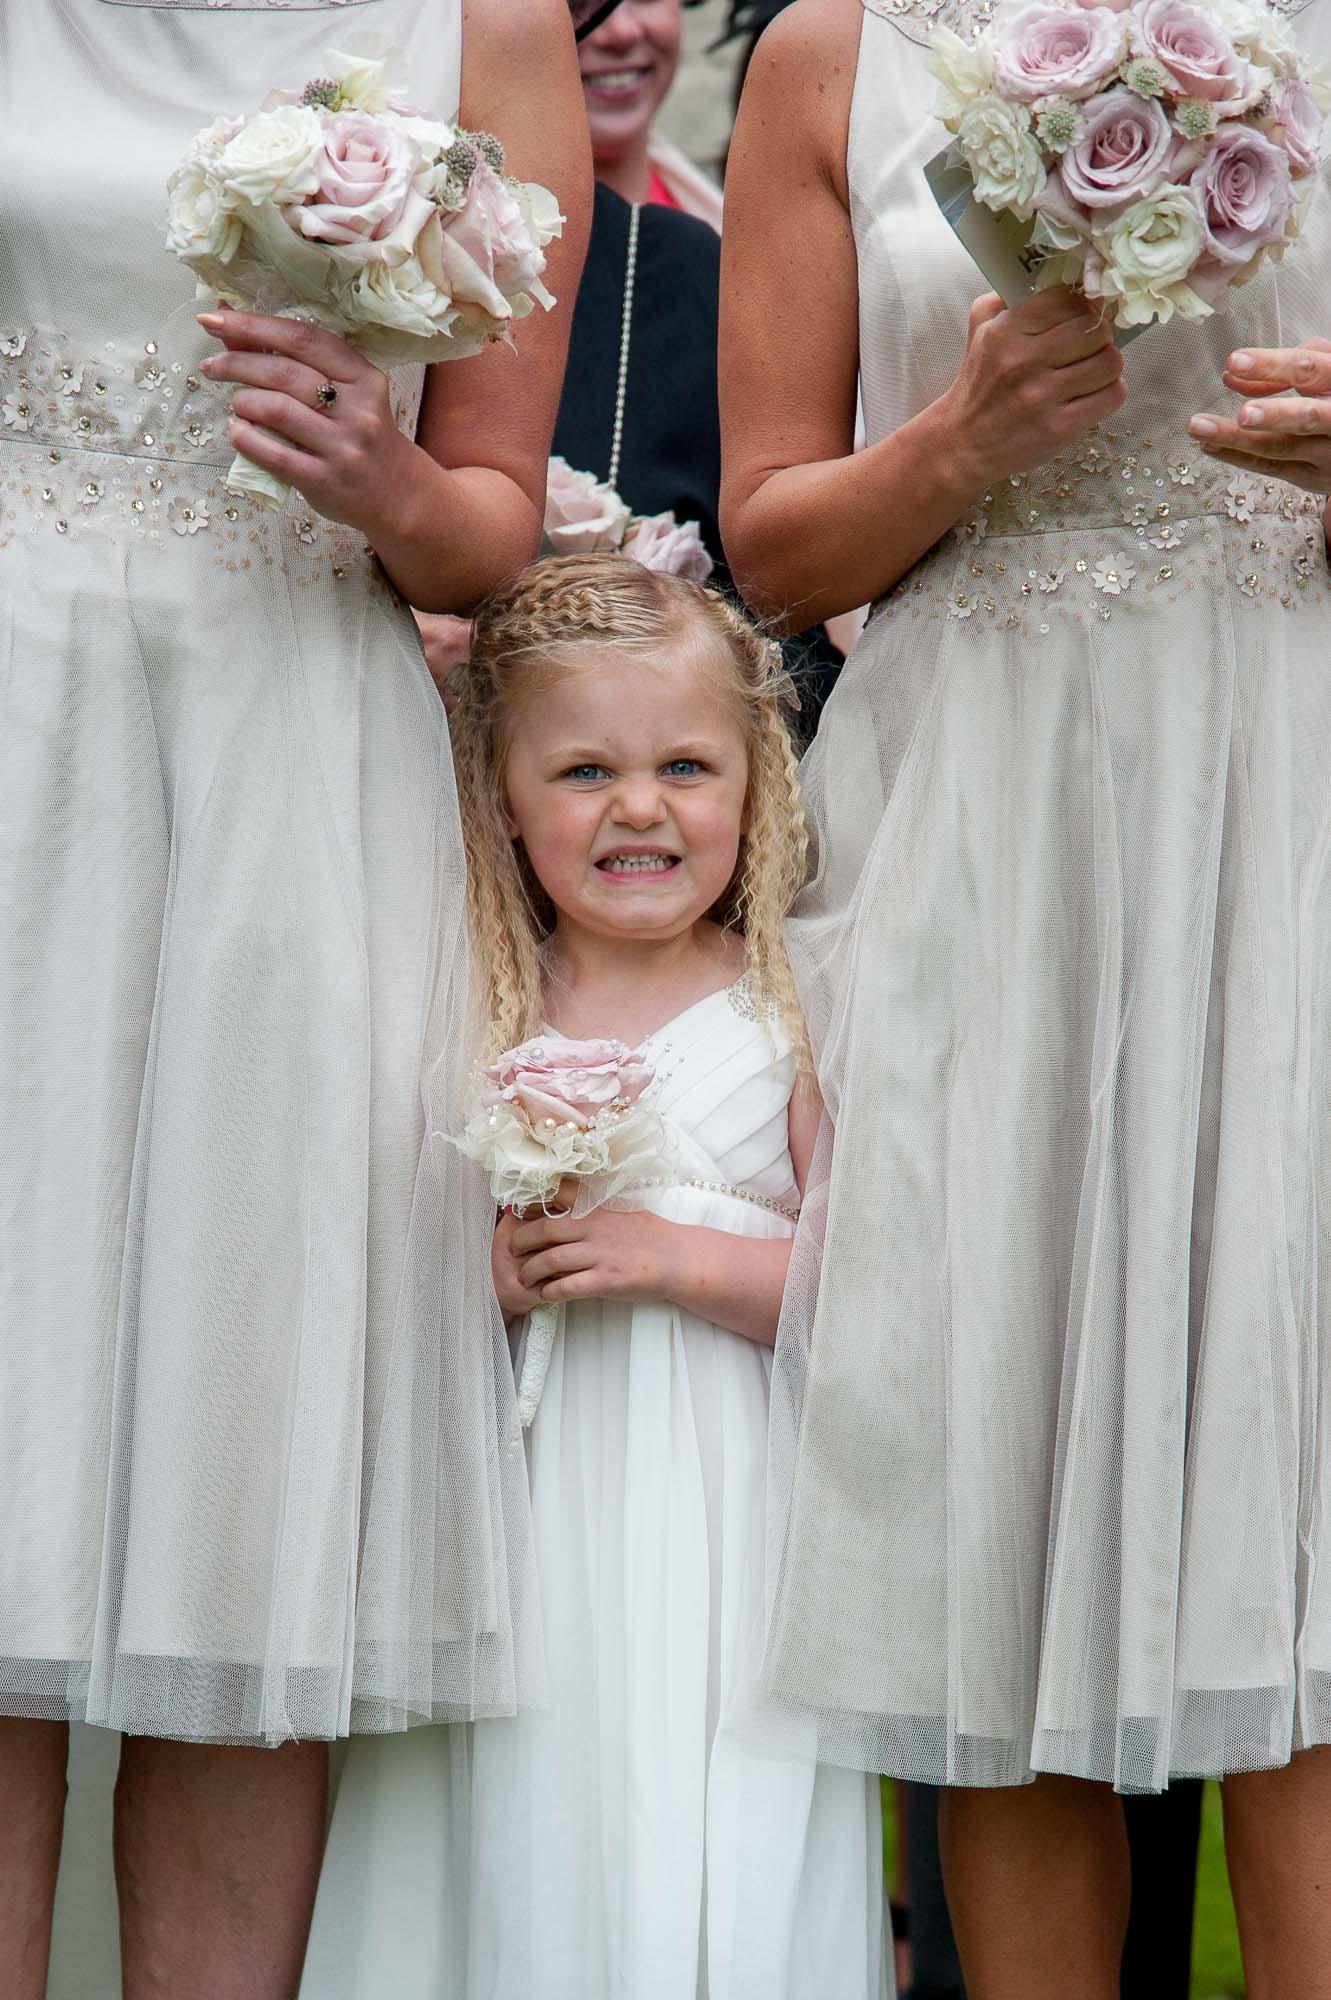 Flower girl peeping from between bridesmaids